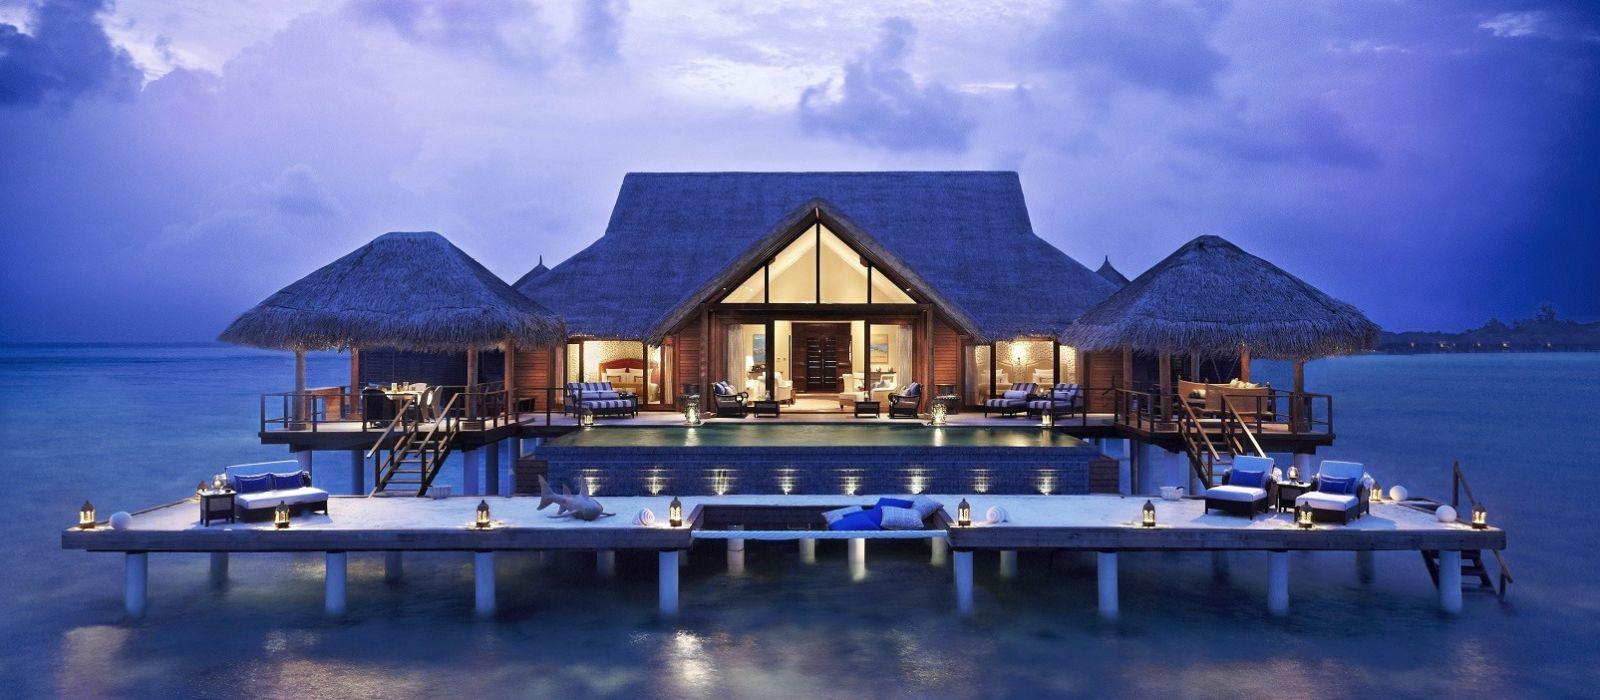 Hotel Taj Exotica Resorts & Spa Maldives